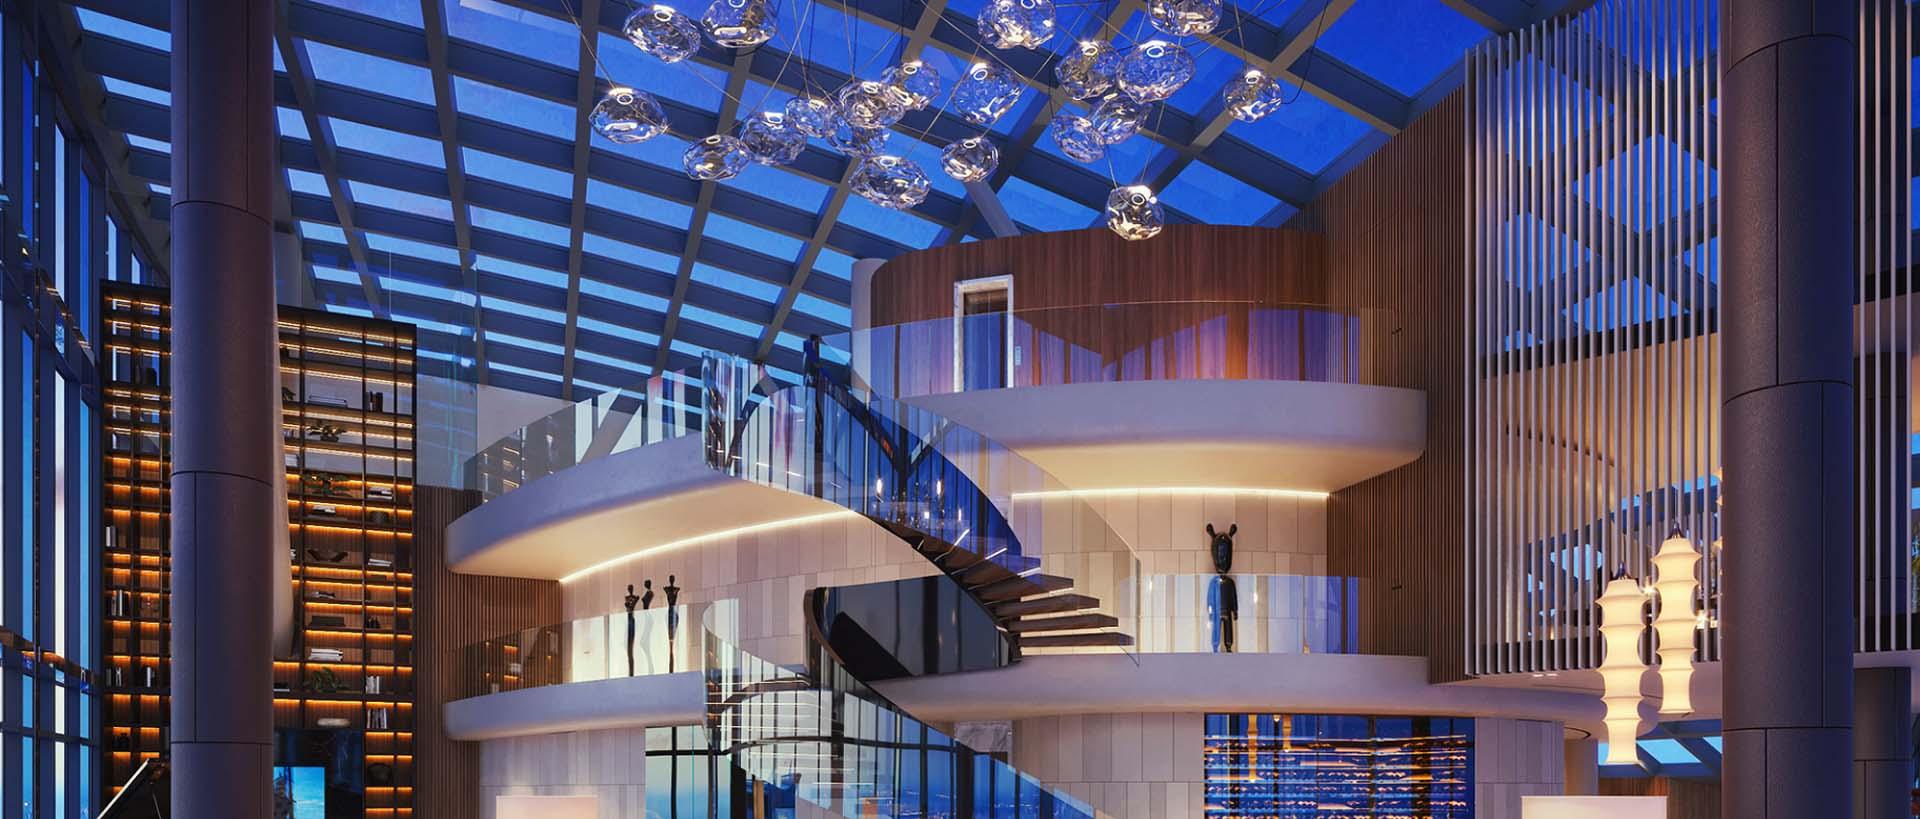 Апартаменты 95 этаж москва сити зоопарк дубай молл